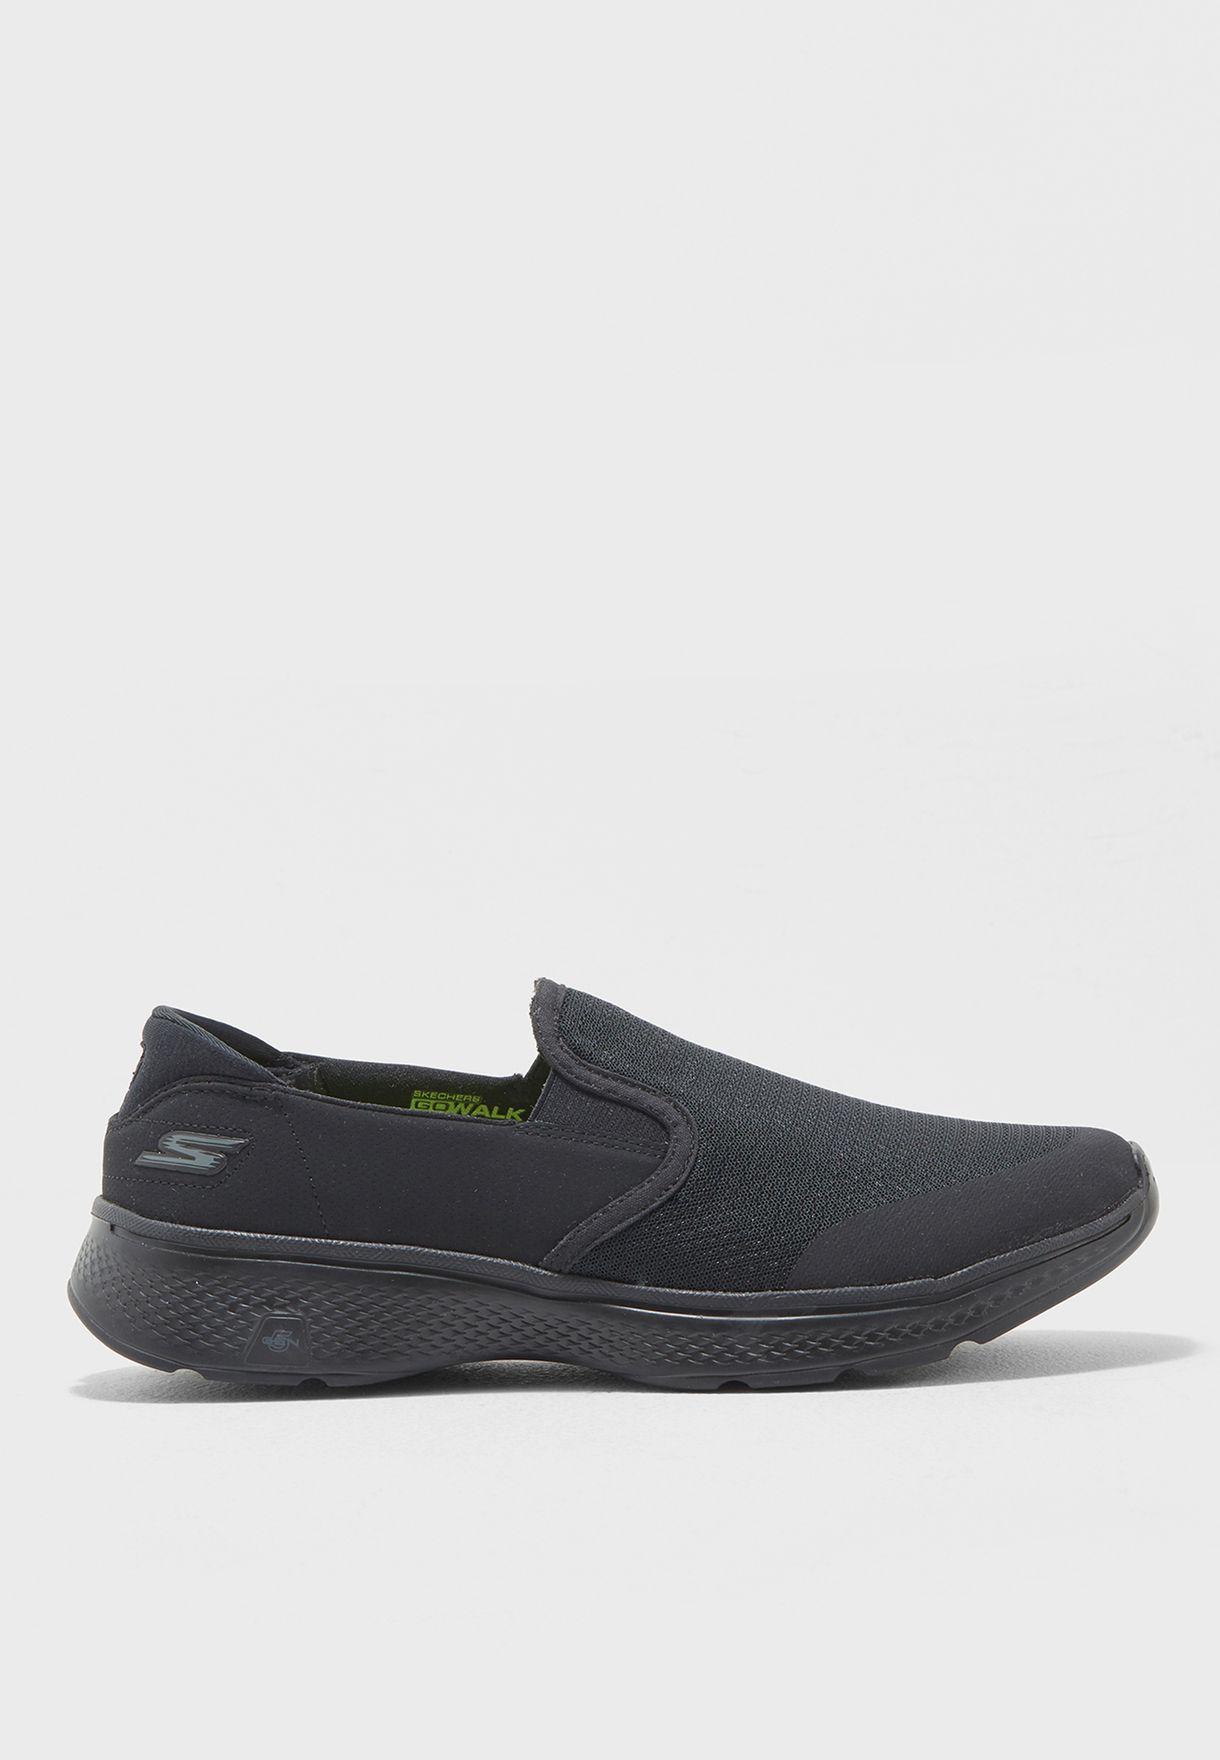 Skechers 54171 BBK Black Skechers Shoes Go Walk 4 Men's